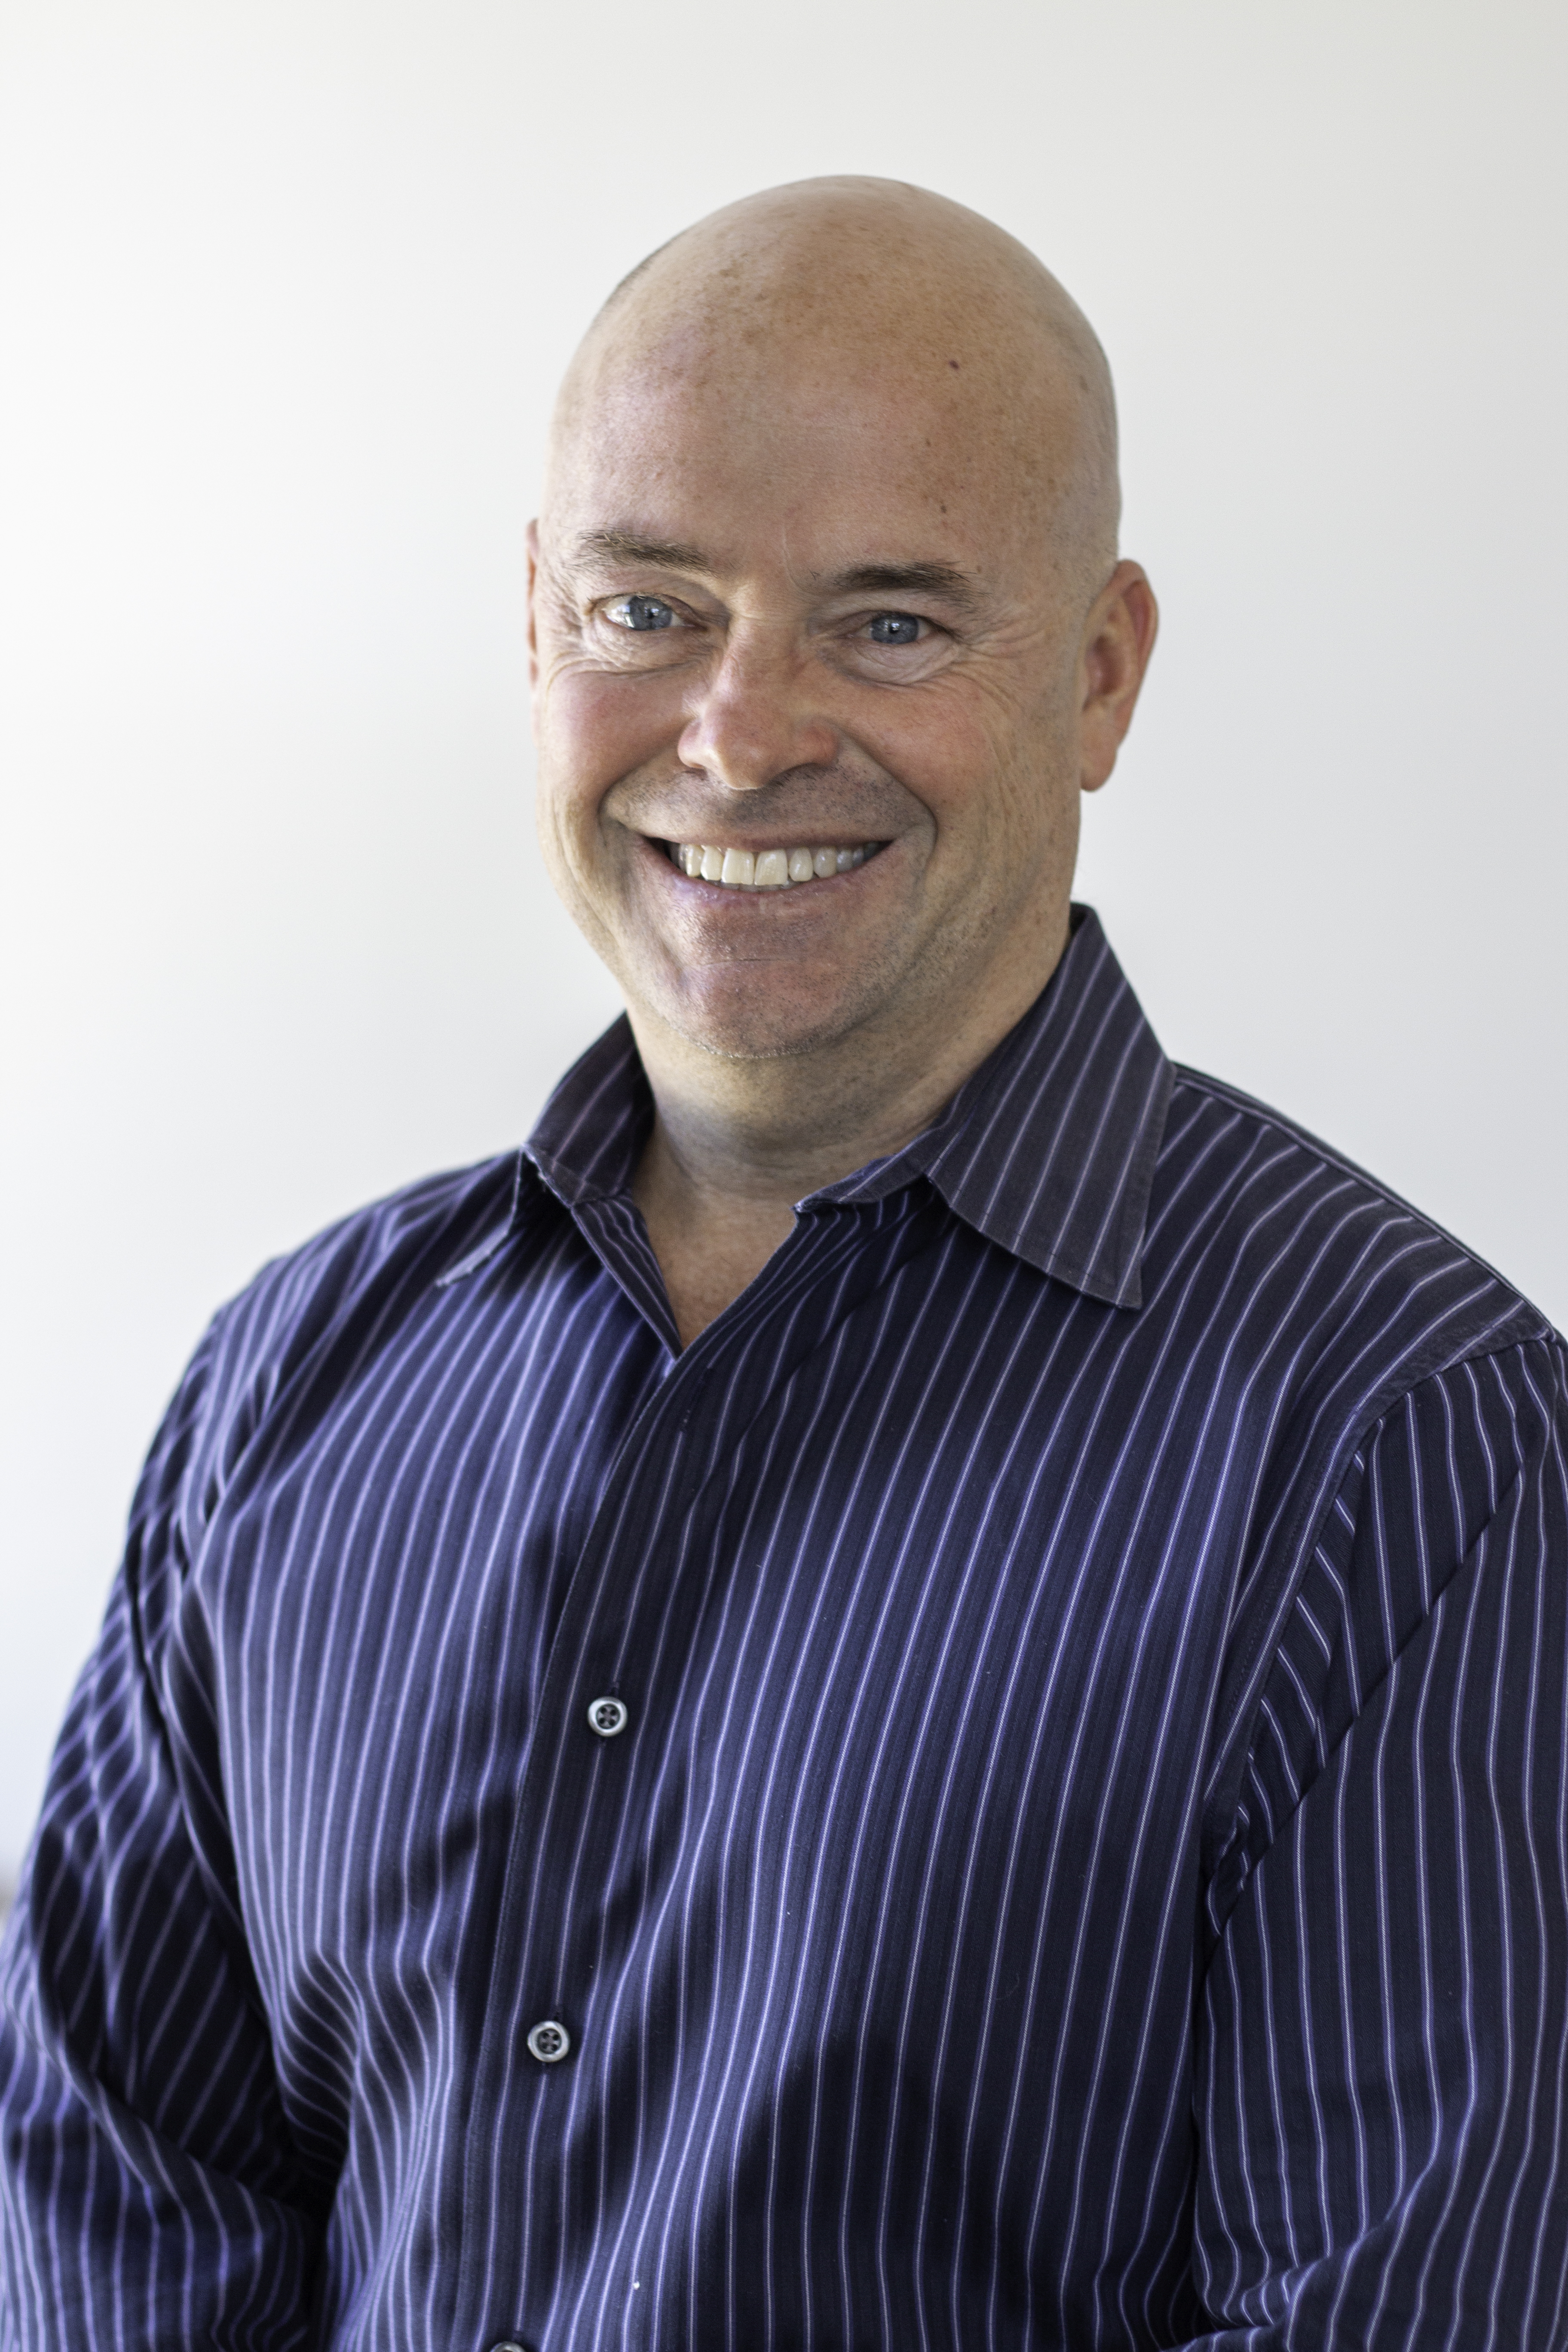 The author Bill Gassett